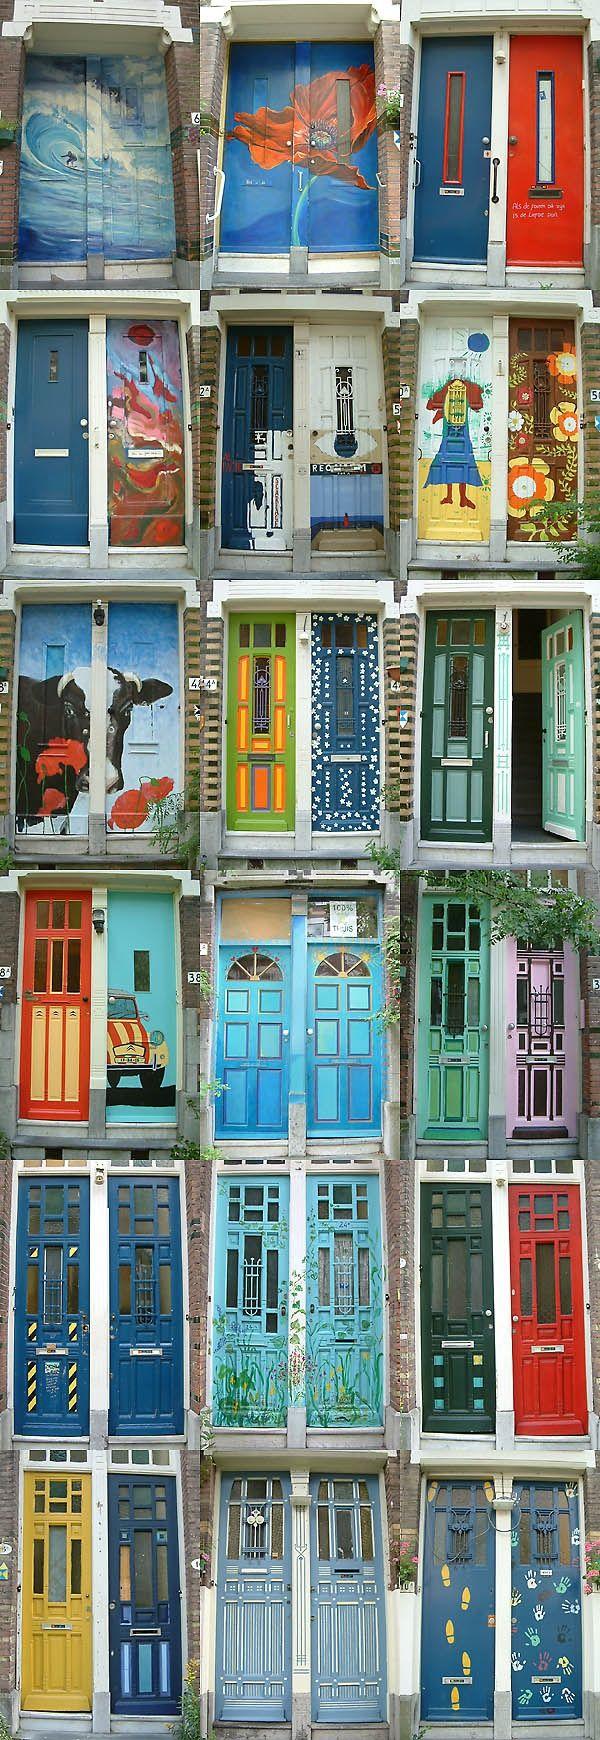 One street. Many, many different doors. (Zwaerdecroonstraat, Rotterdam, The Netherlands) #Rotterdam #Netherlands